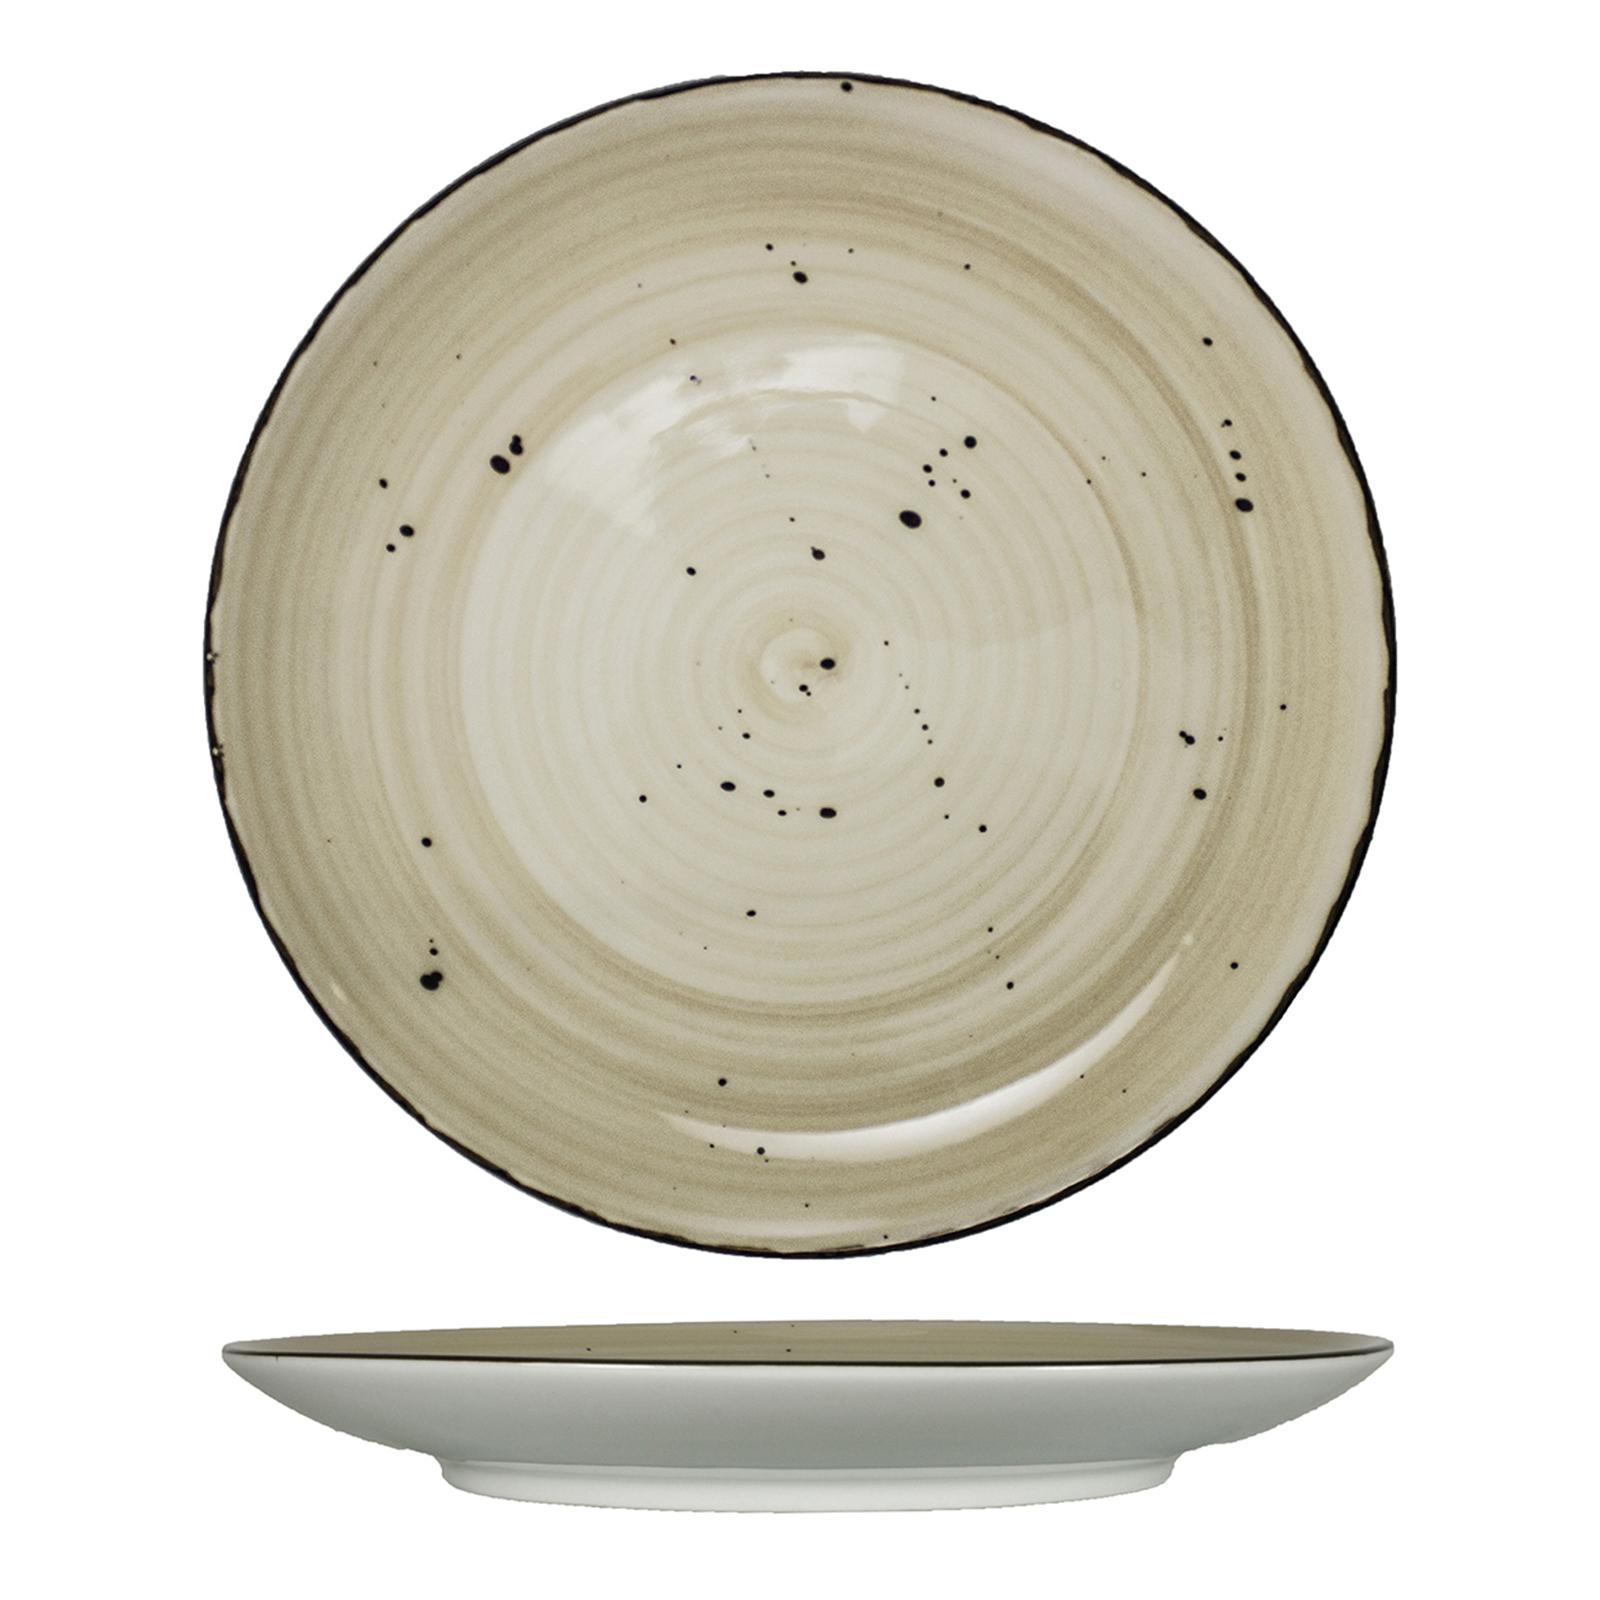 International Tableware RT-5-WH plate, china